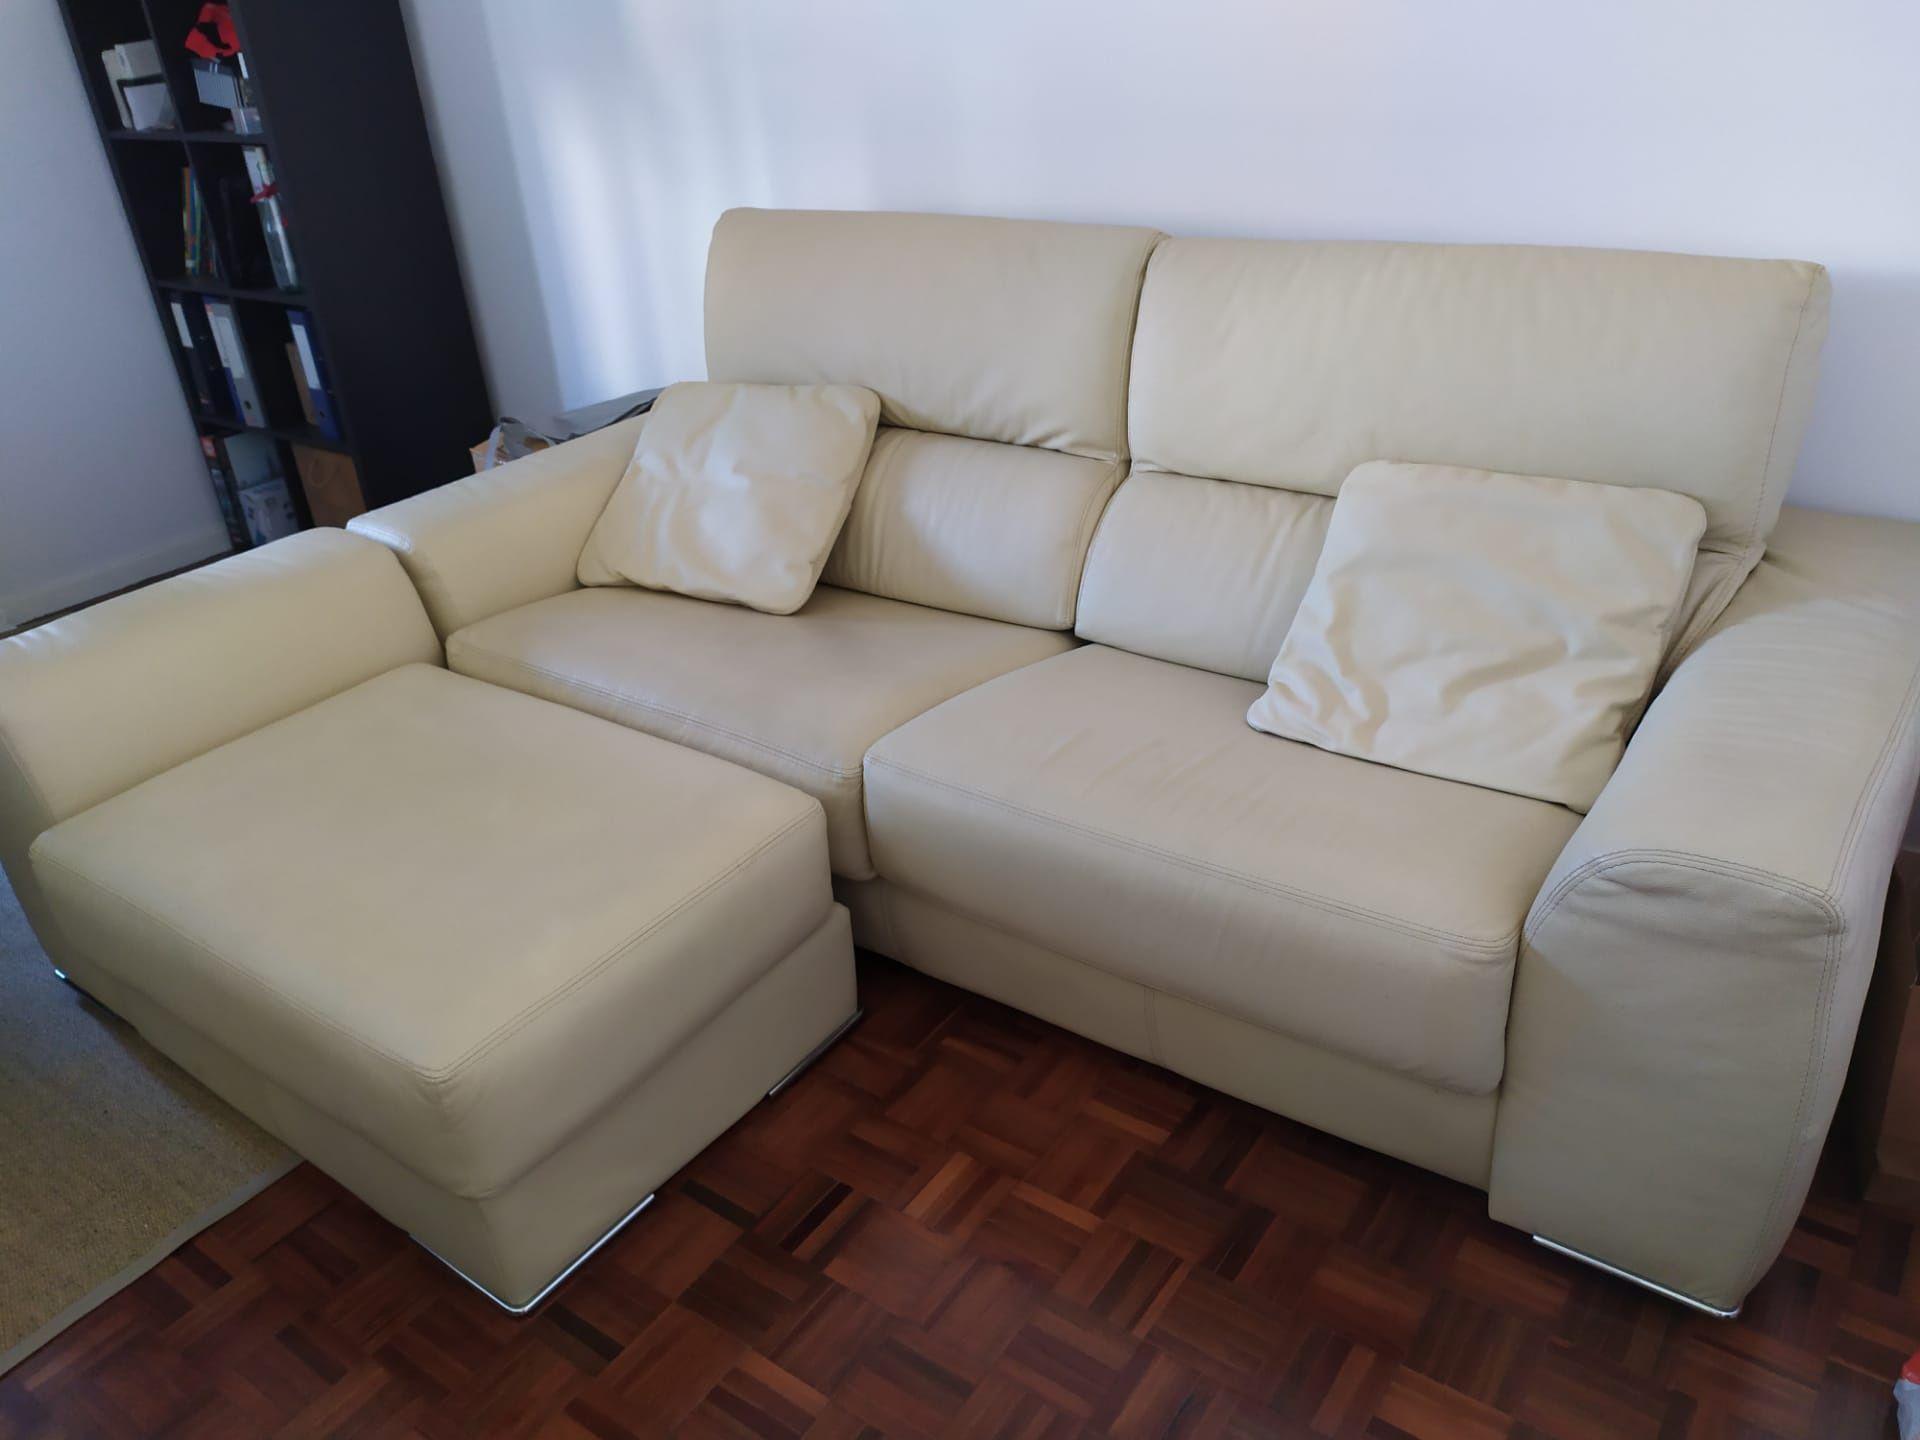 Sofa pele bege com chaise longue